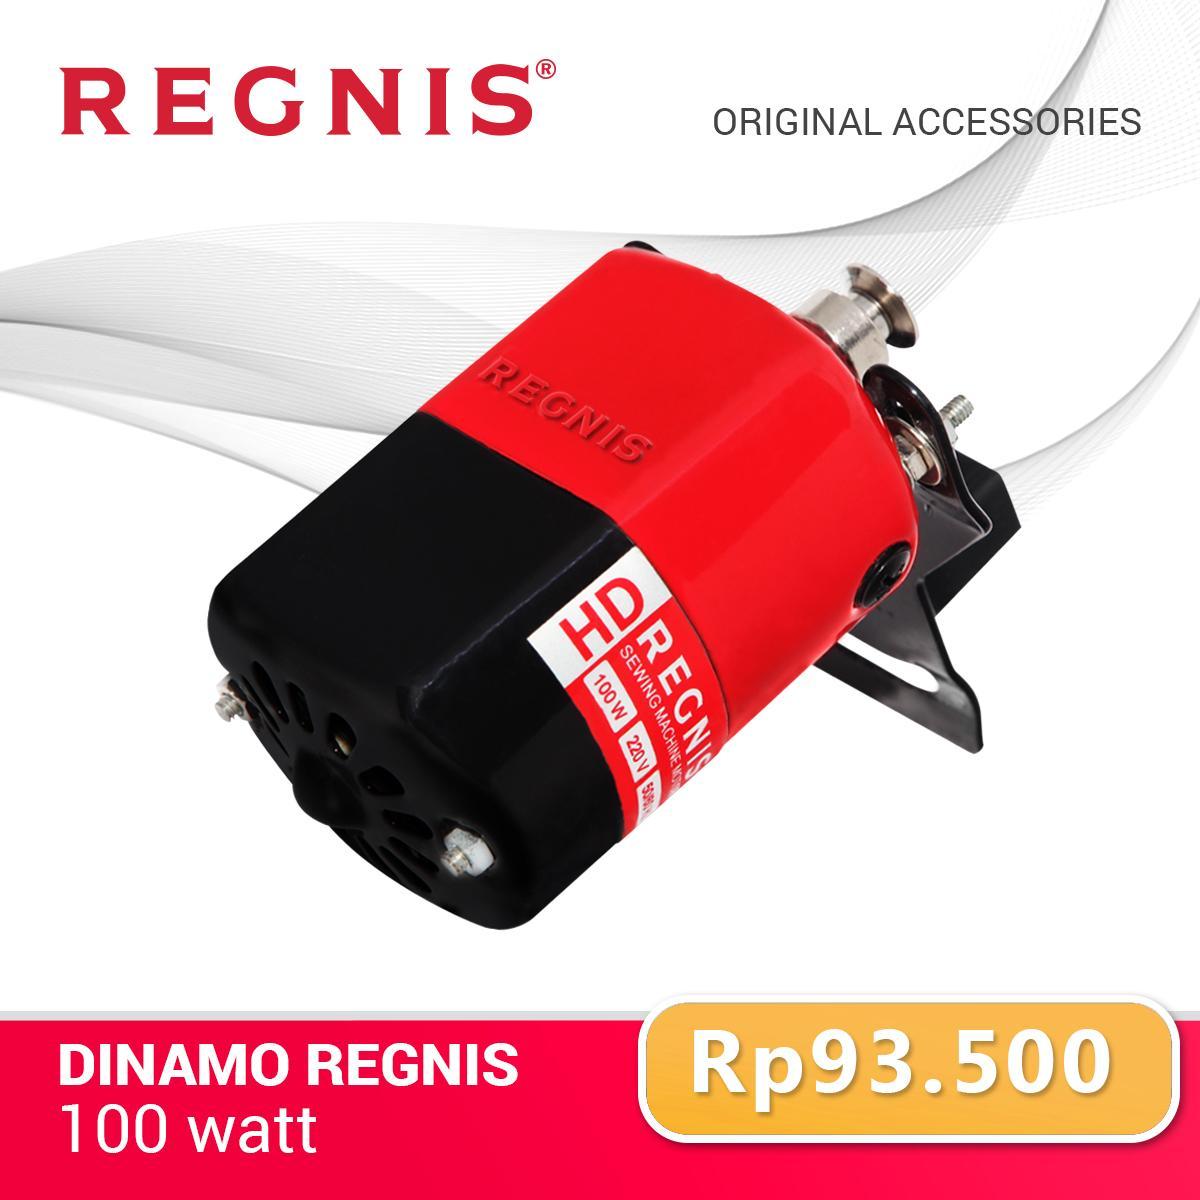 REGNIS Dinamo 100 Watt